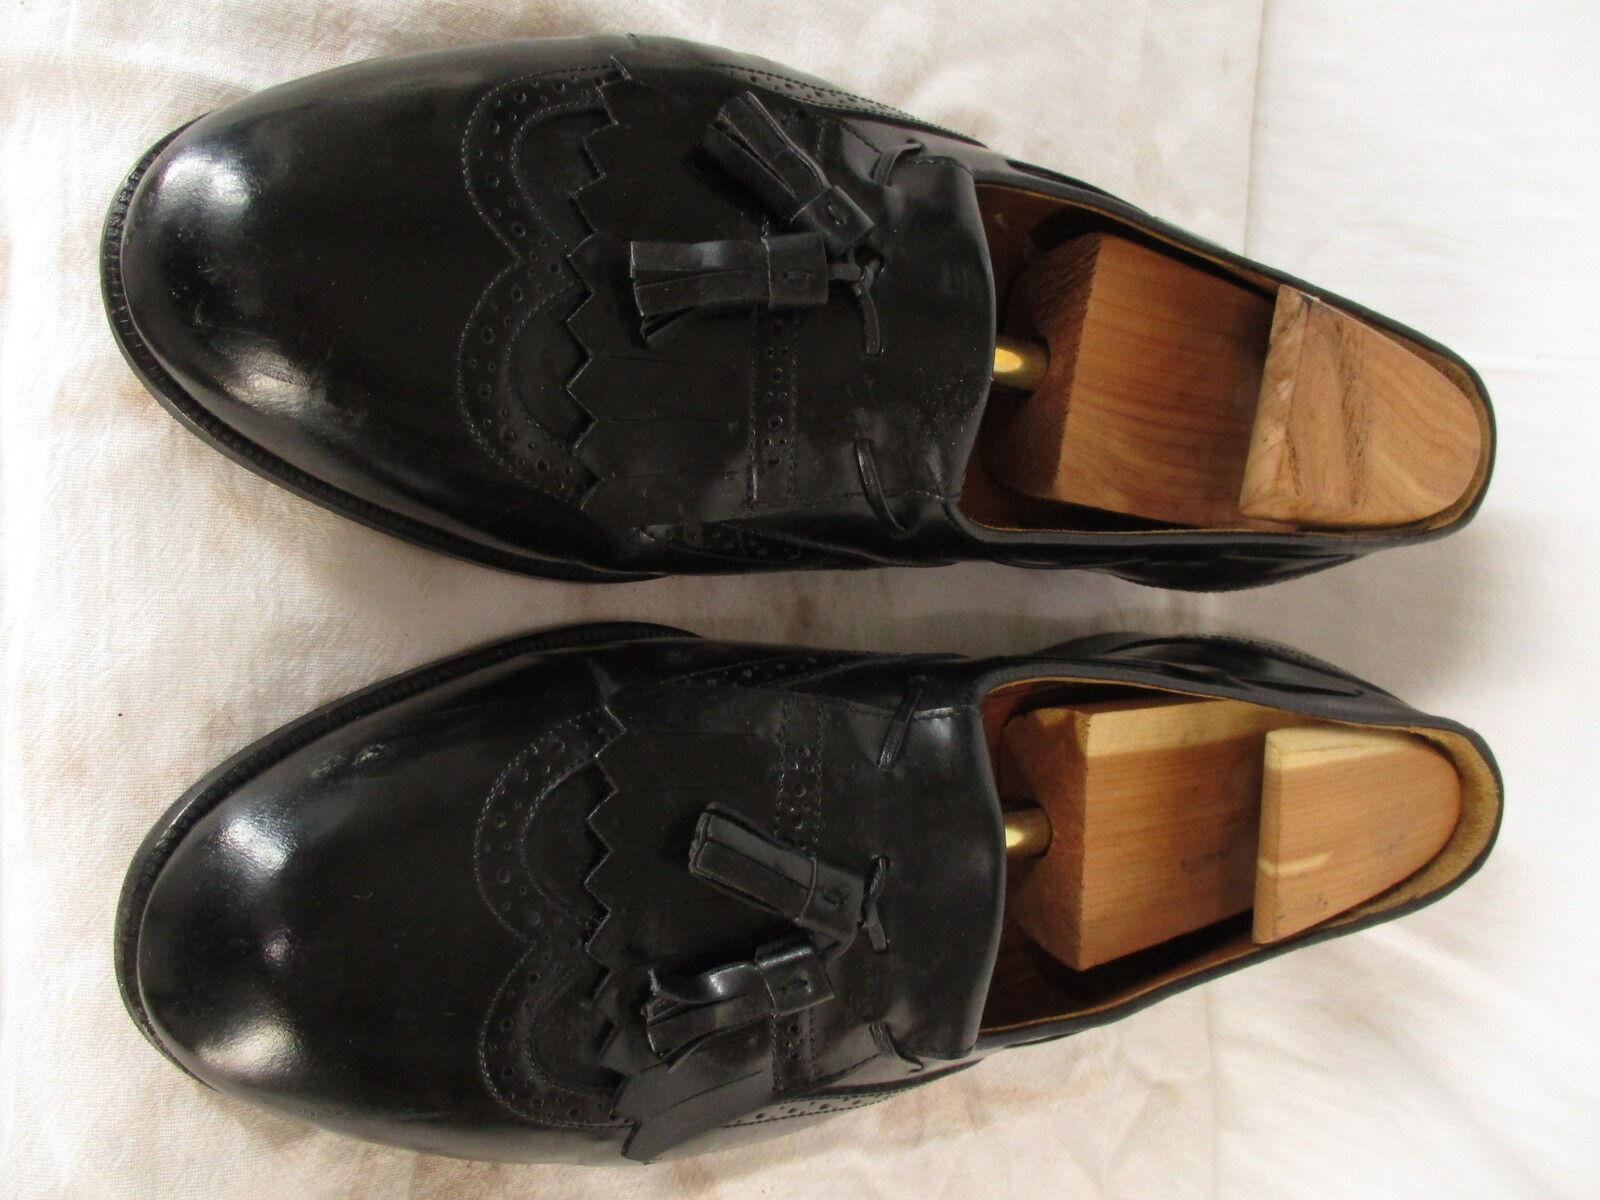 Churchs Prima Classe Mens Black Wingtip Tassel Loafers 11.5W  Made